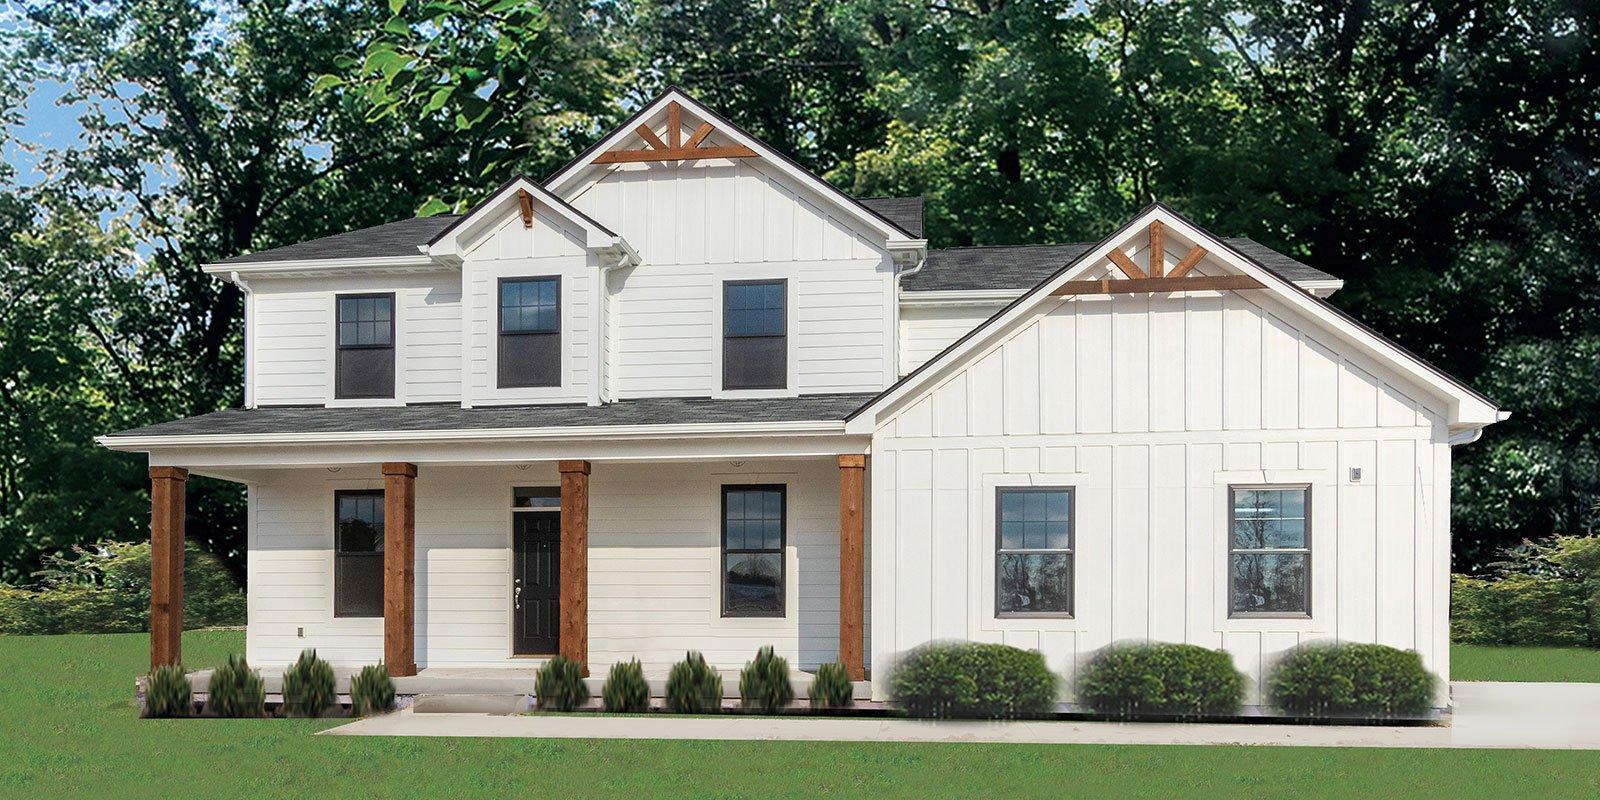 Central Indiana Home Builder - Davis Homes